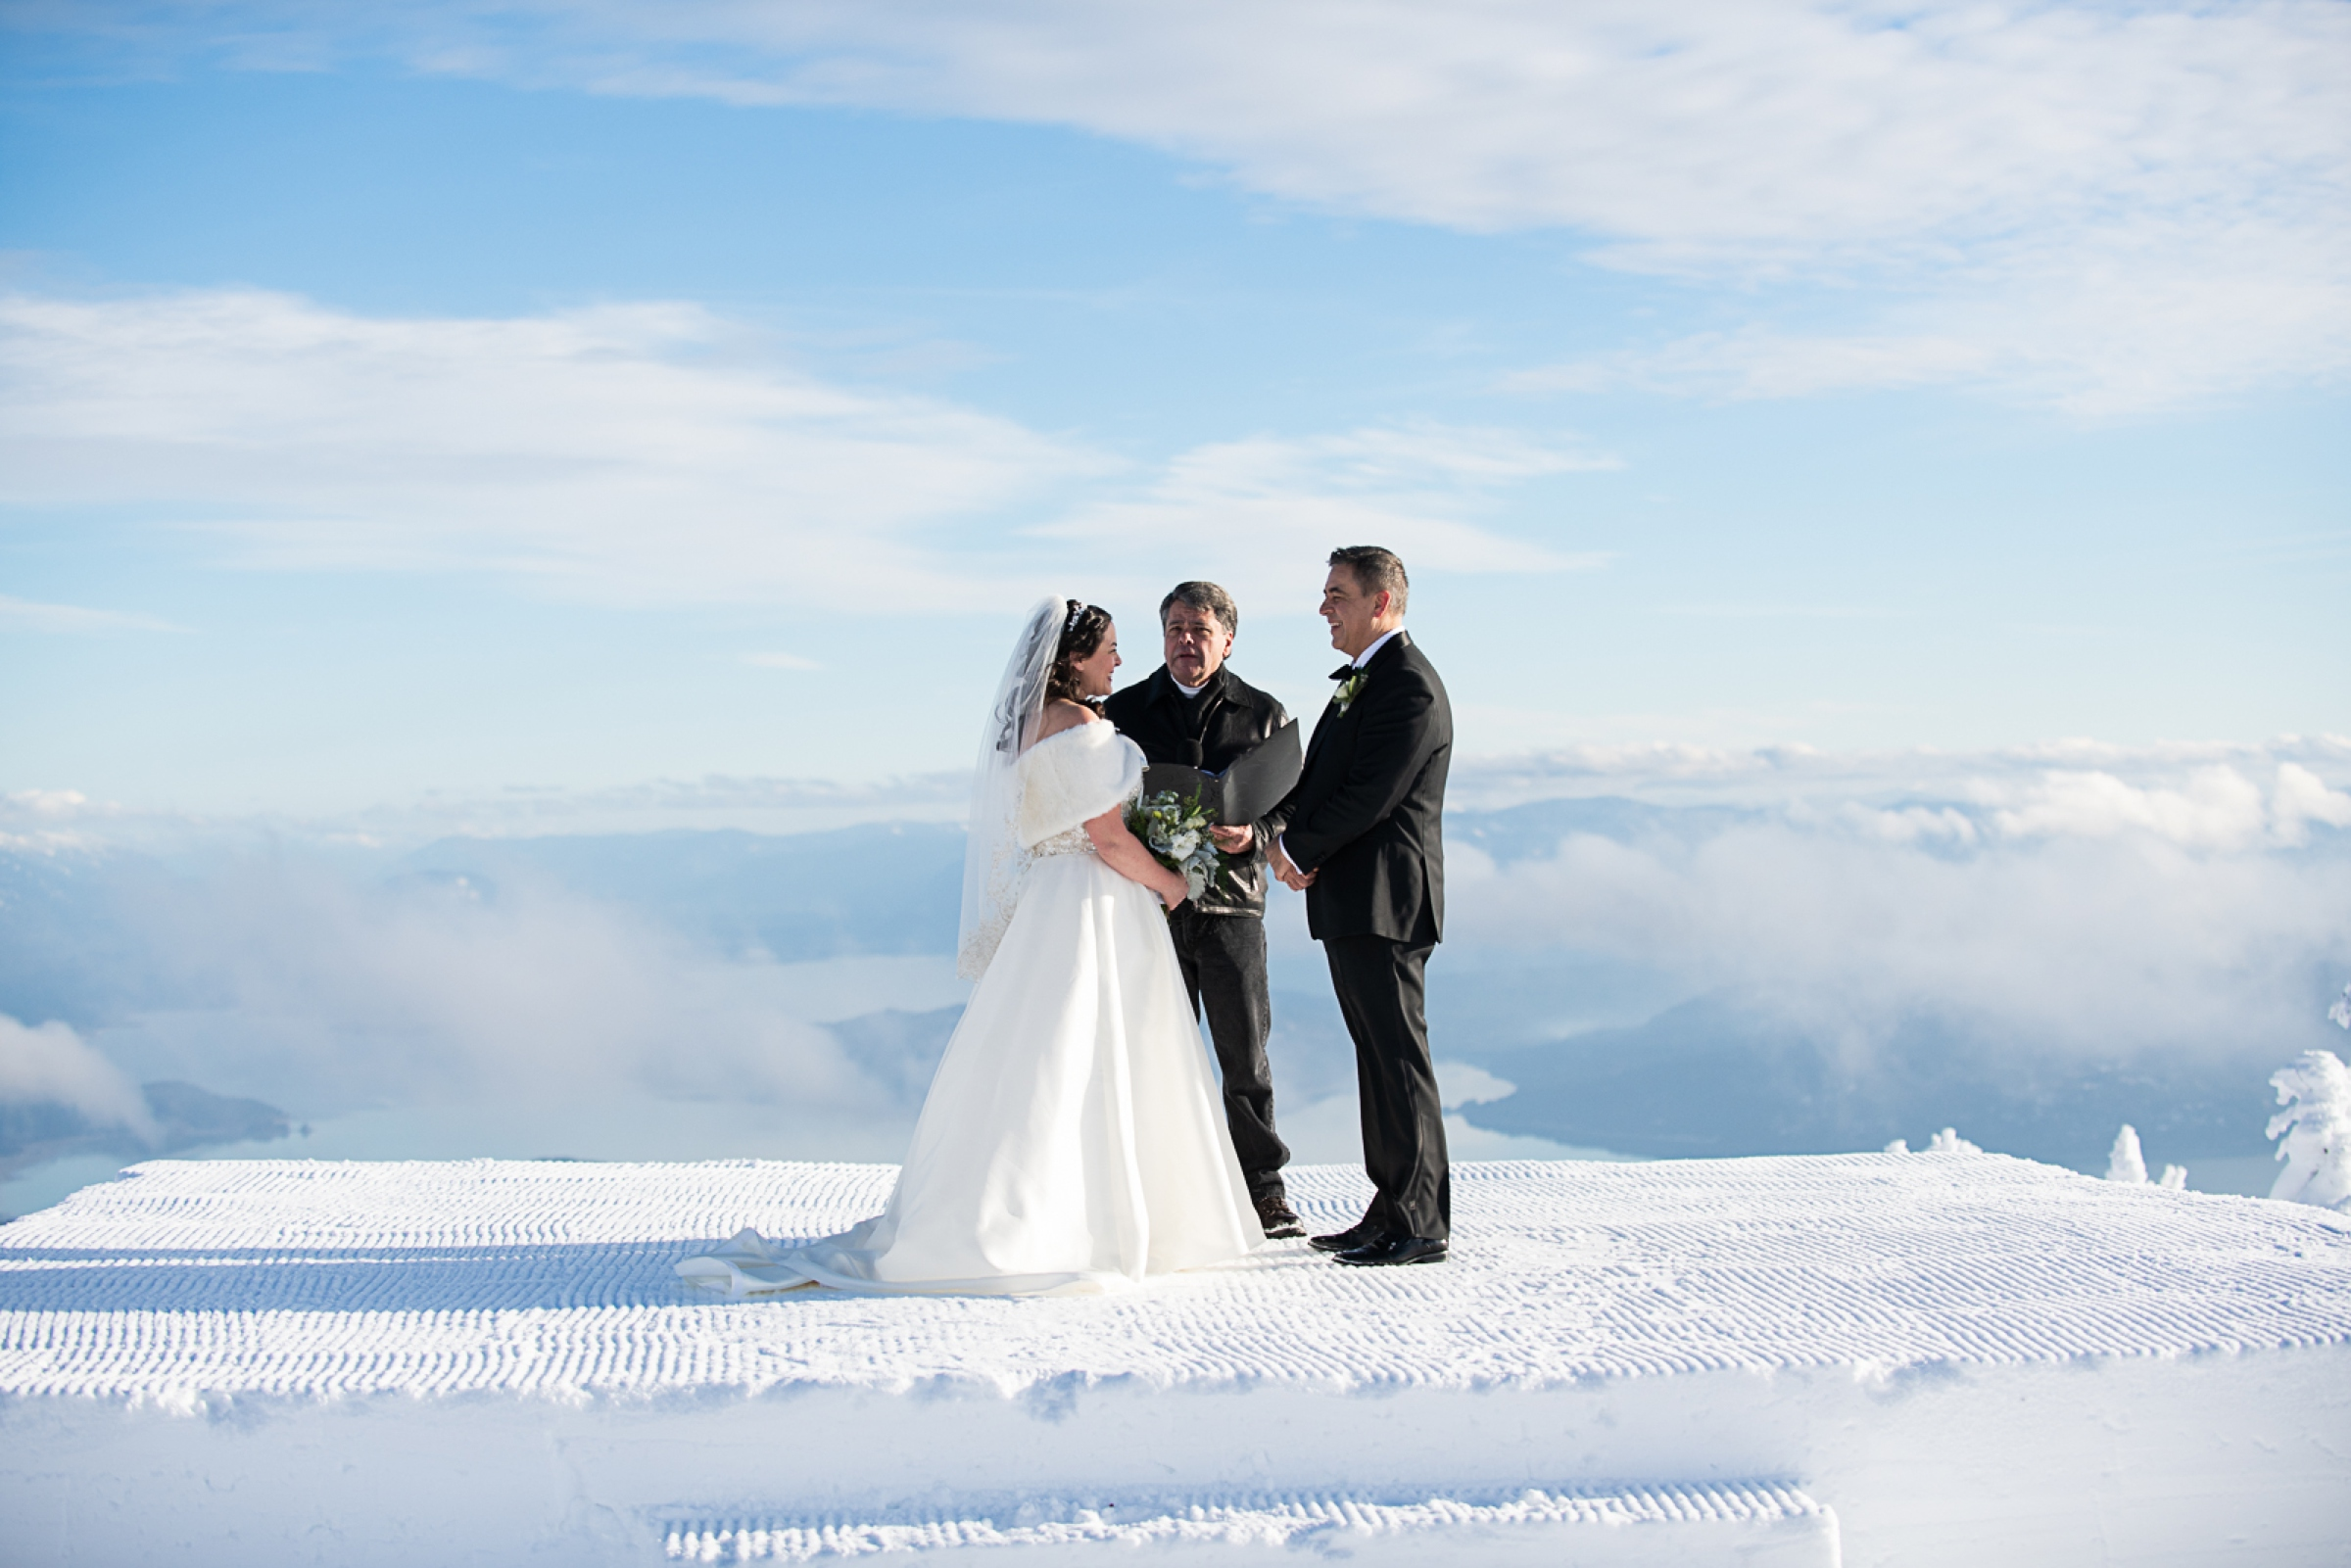 Janel-Gion-Wedding-Photographer-KristinRon-Sandpoint-Idaho.jpg_0007.jpg